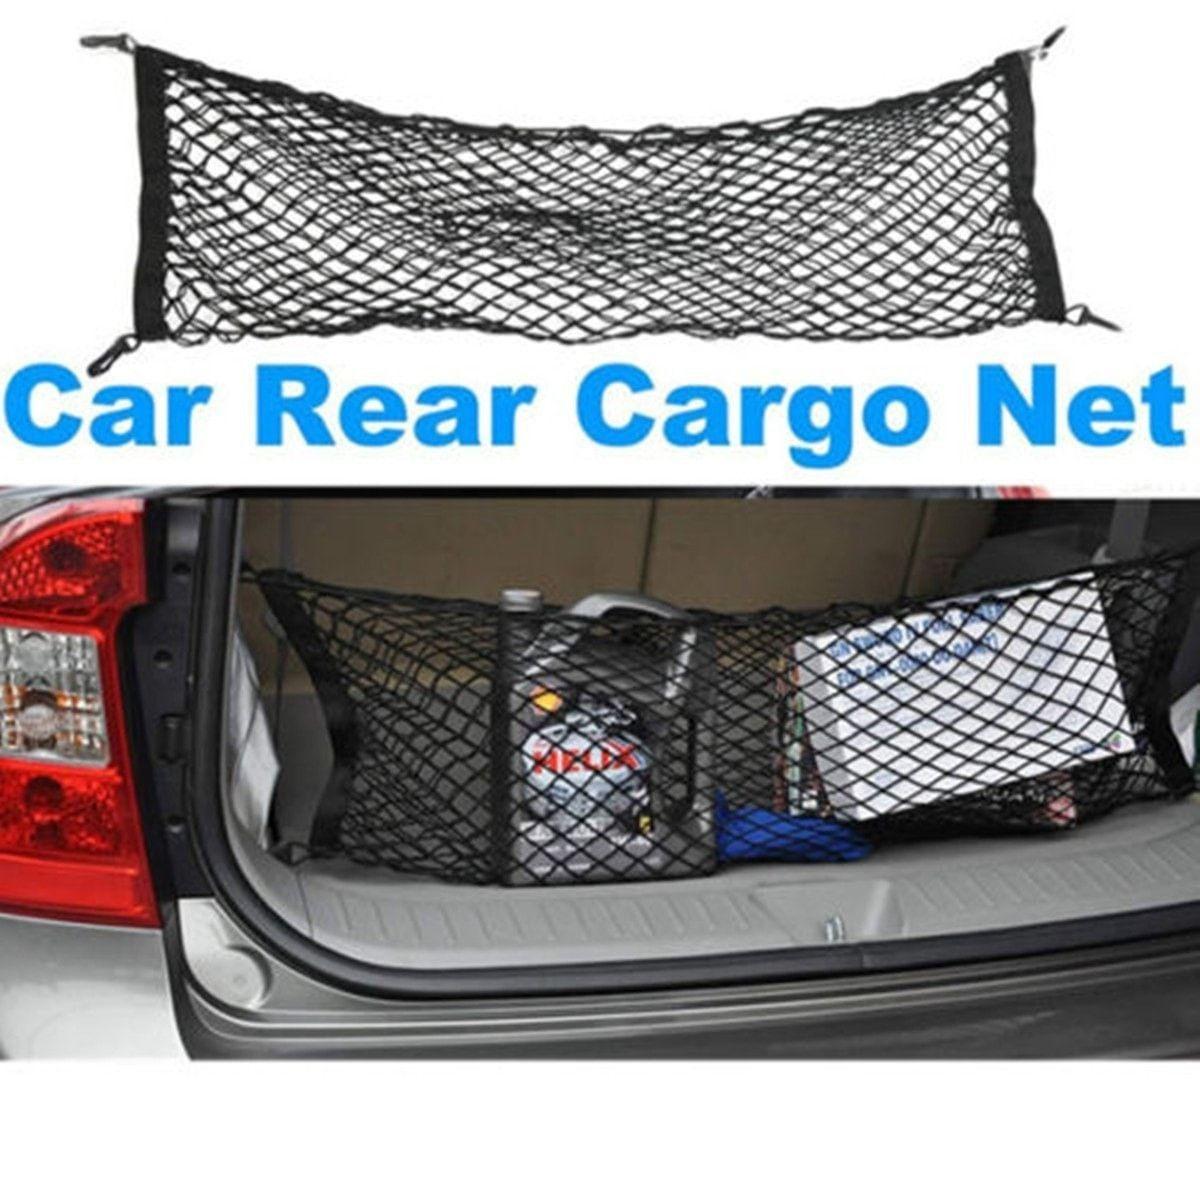 90x35cm Versatile Car SUV Truck Cargo Rear Storage Luggage Elastic Mesh Net Kit